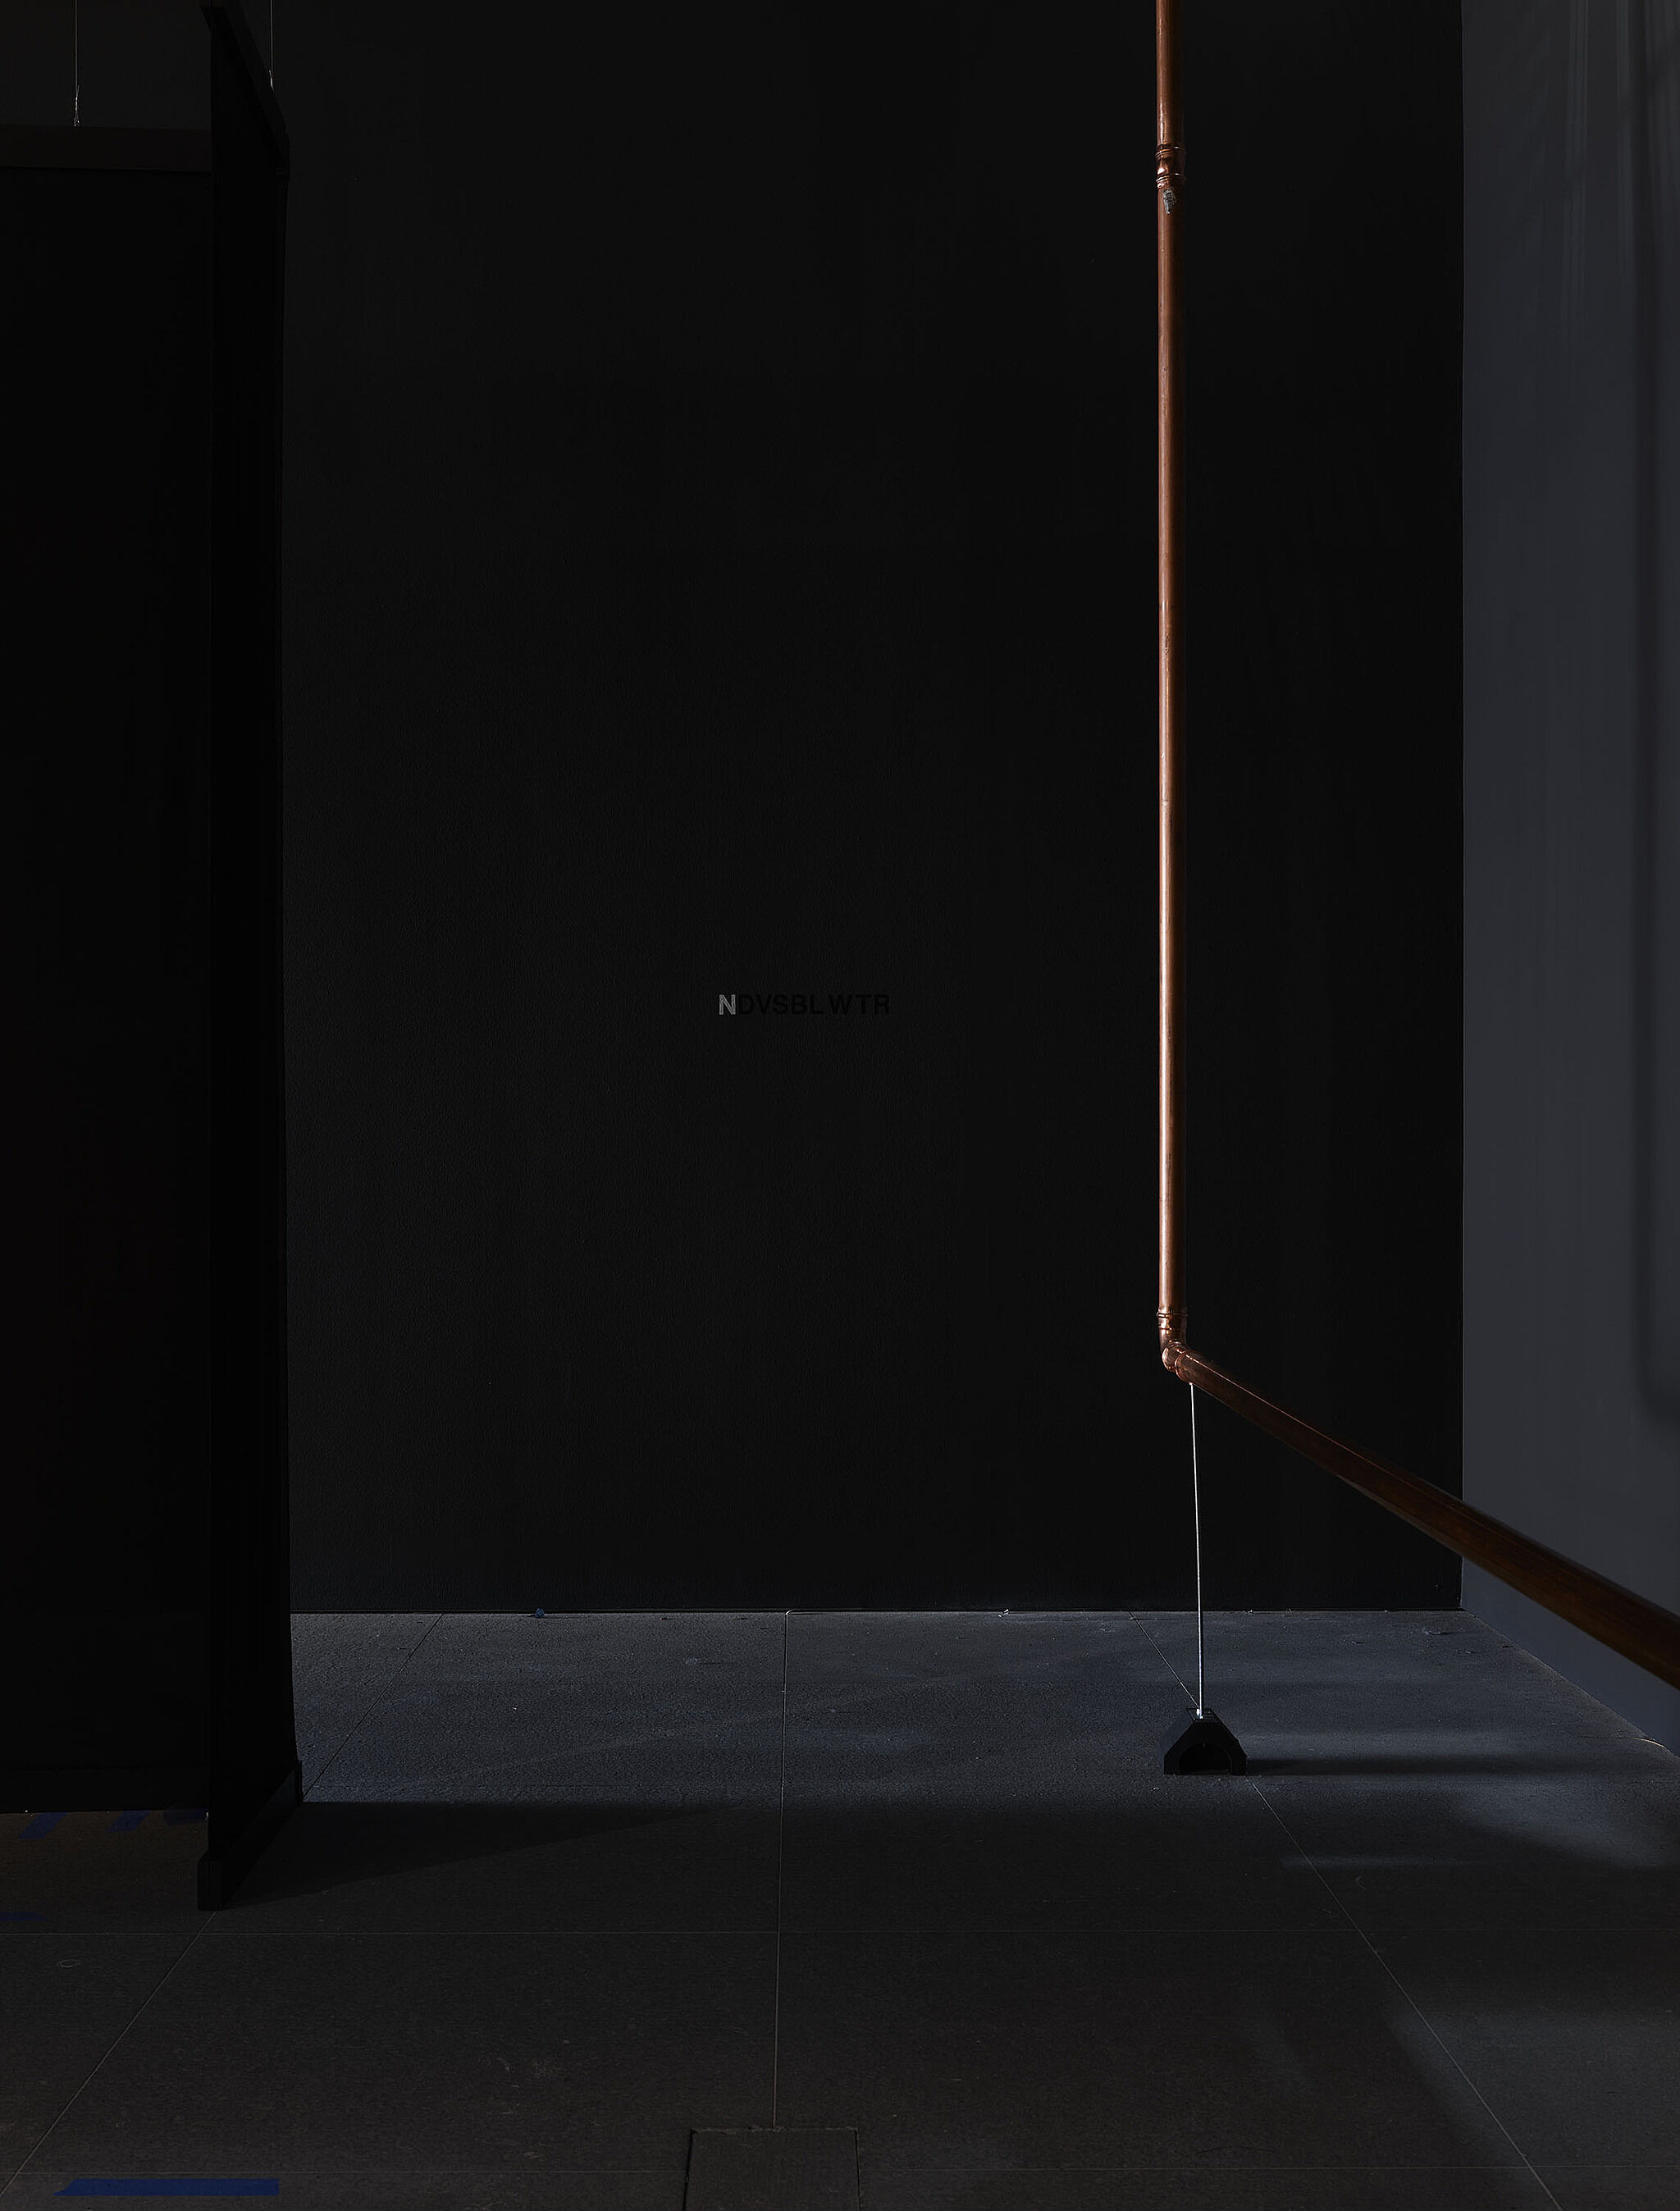 A copper pipe in a dark room.